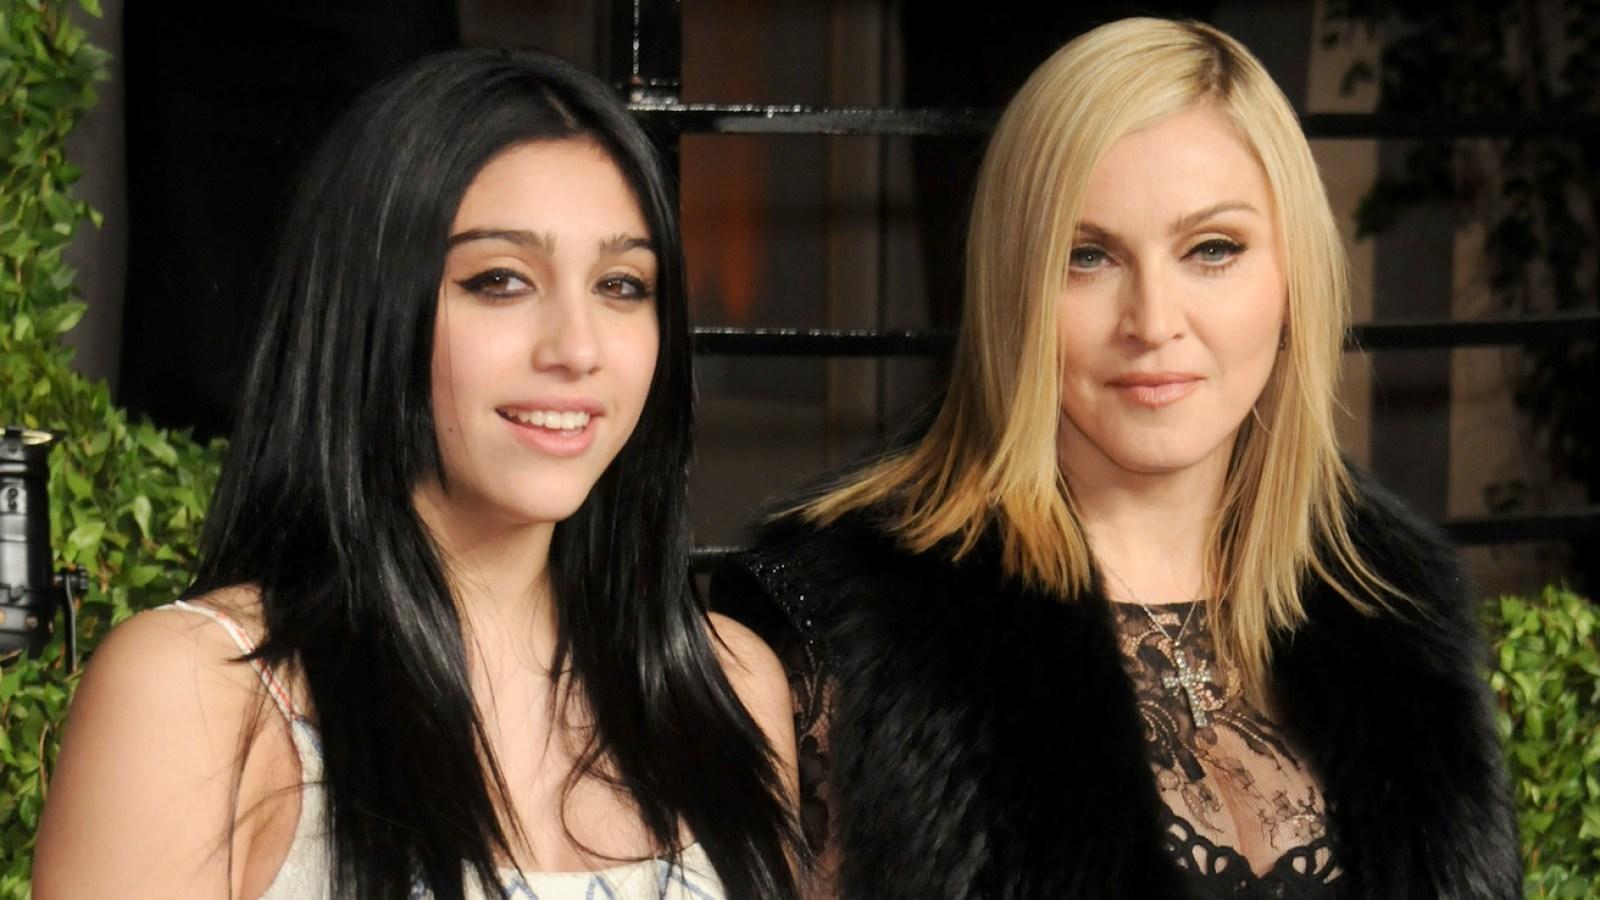 Madonna Wishes Daughter Lourdes Happy 21st Birthday With Sweet Posts